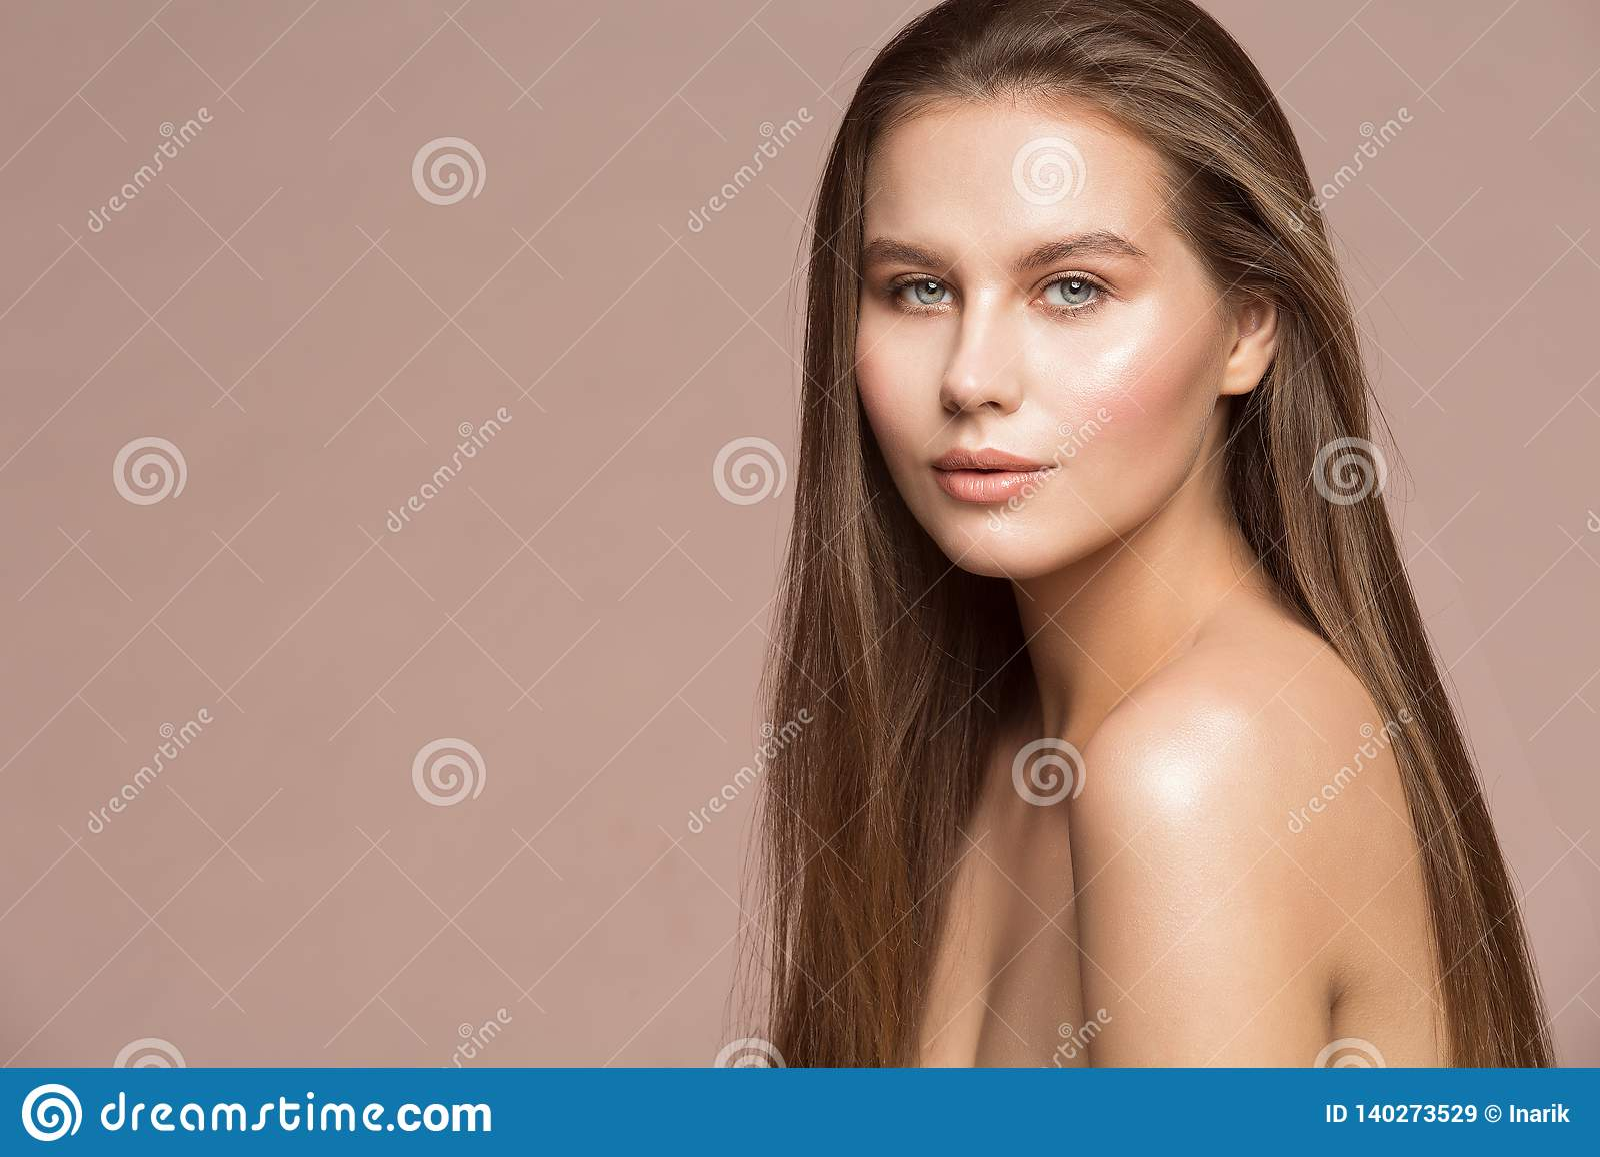 Fashion Model Beauty Makeup, Beautiful Woman Long Hair Wet Skin Make Up, Girl Studio Portrait